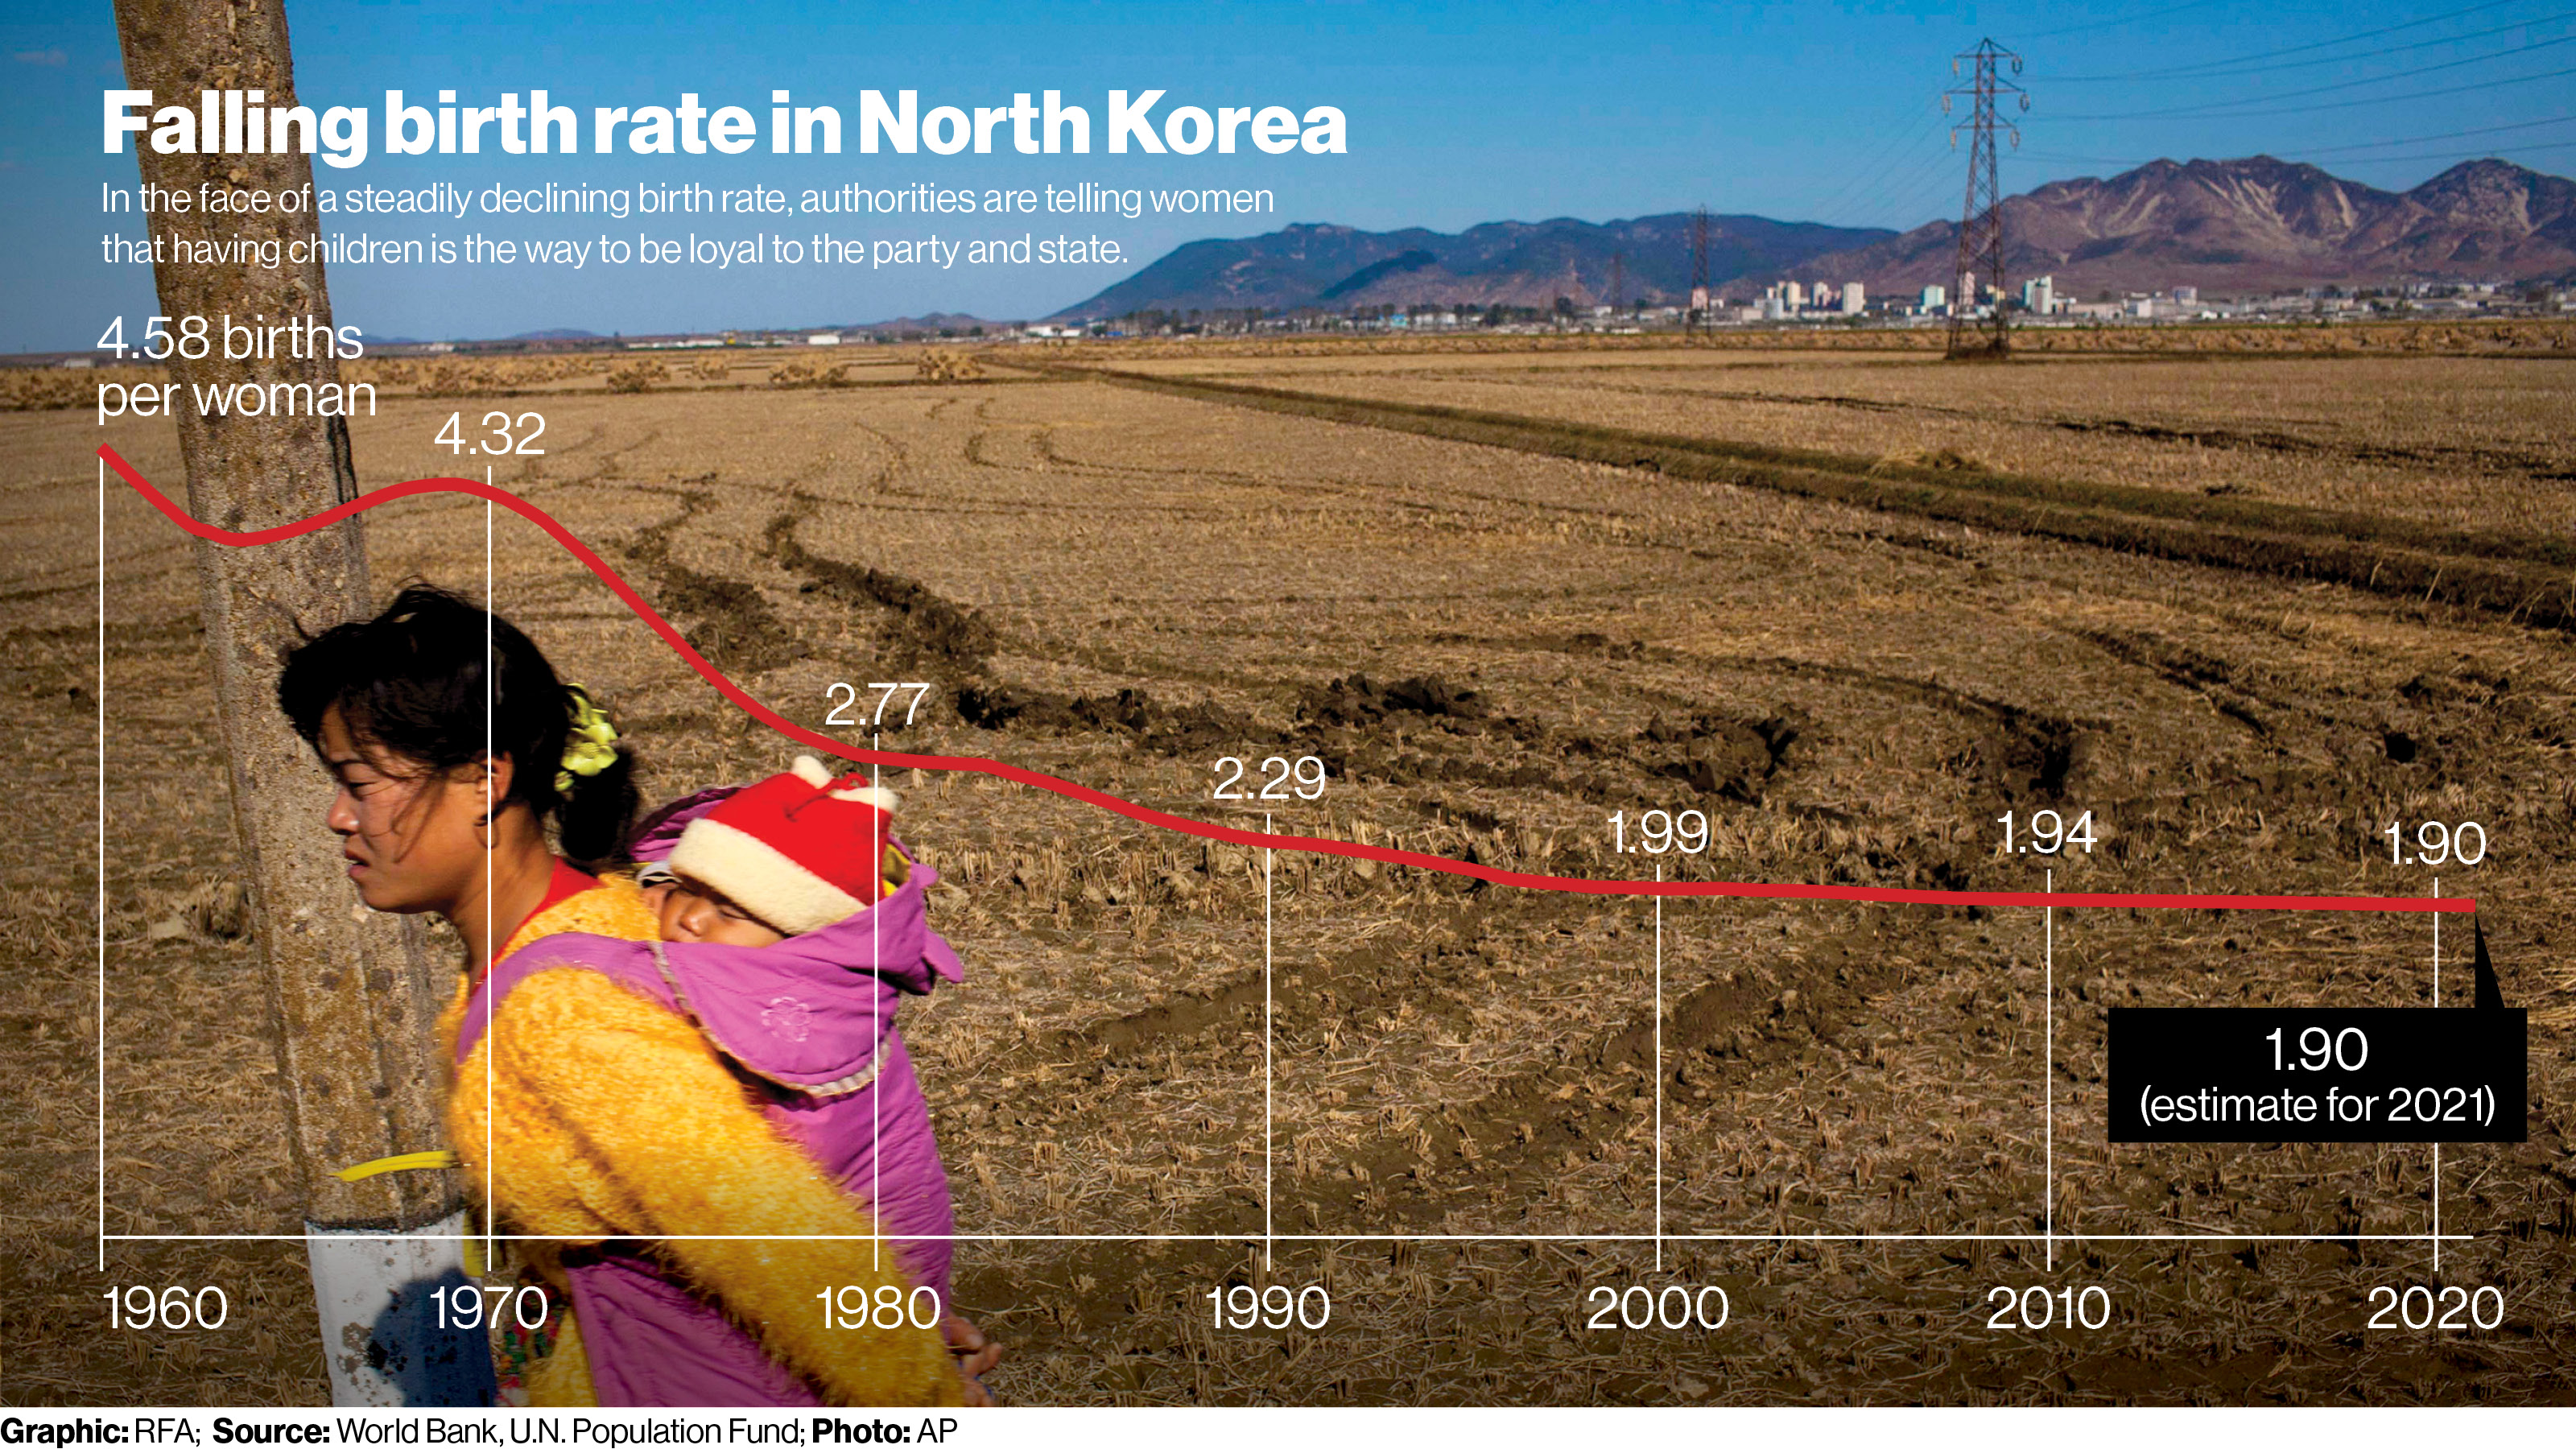 North_Korea_Birth_Rate_16x9.jpg